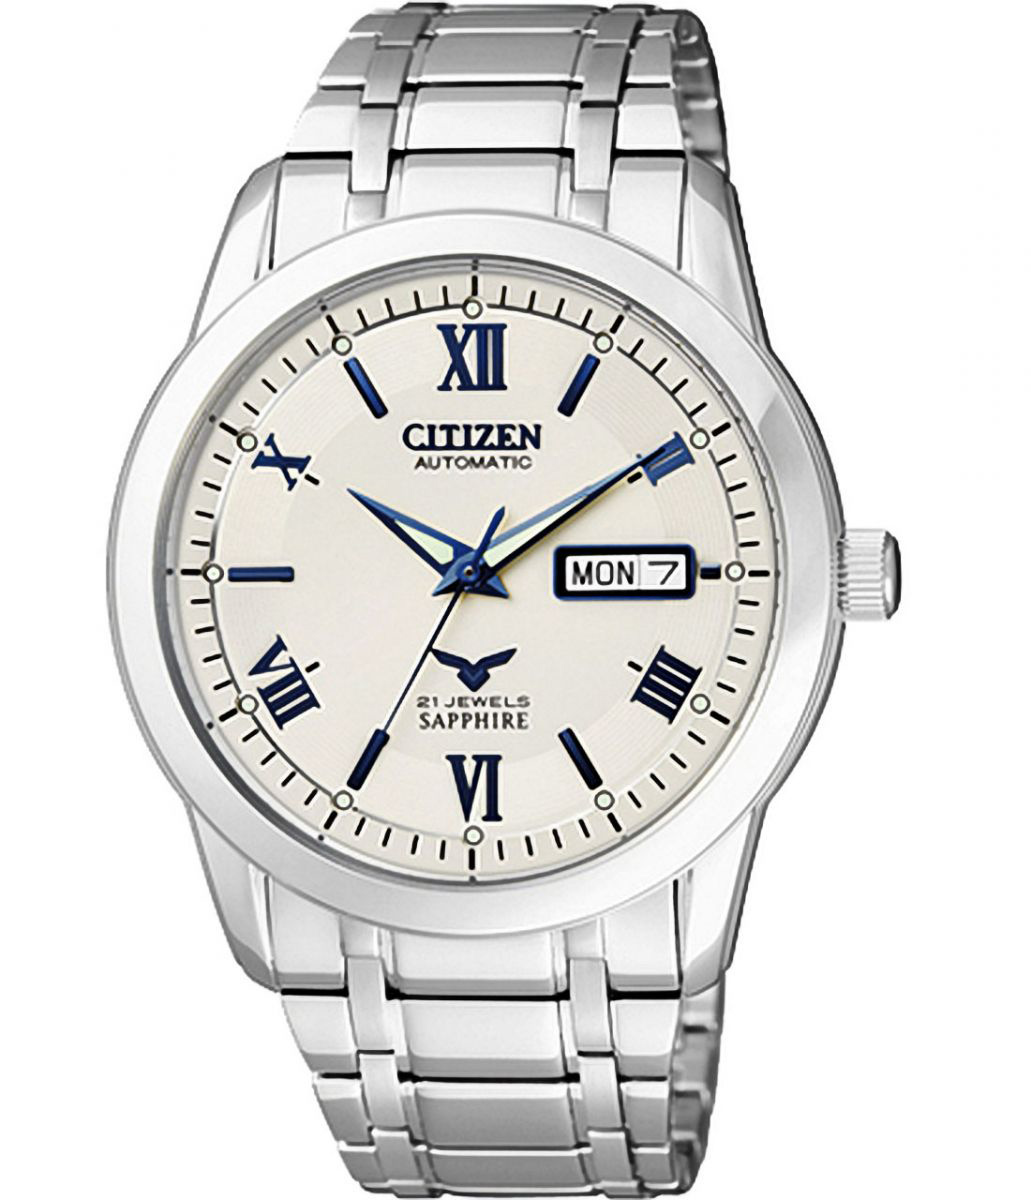 Đồng hồ nam cao cấp Citizen NH8290-59A Automatic